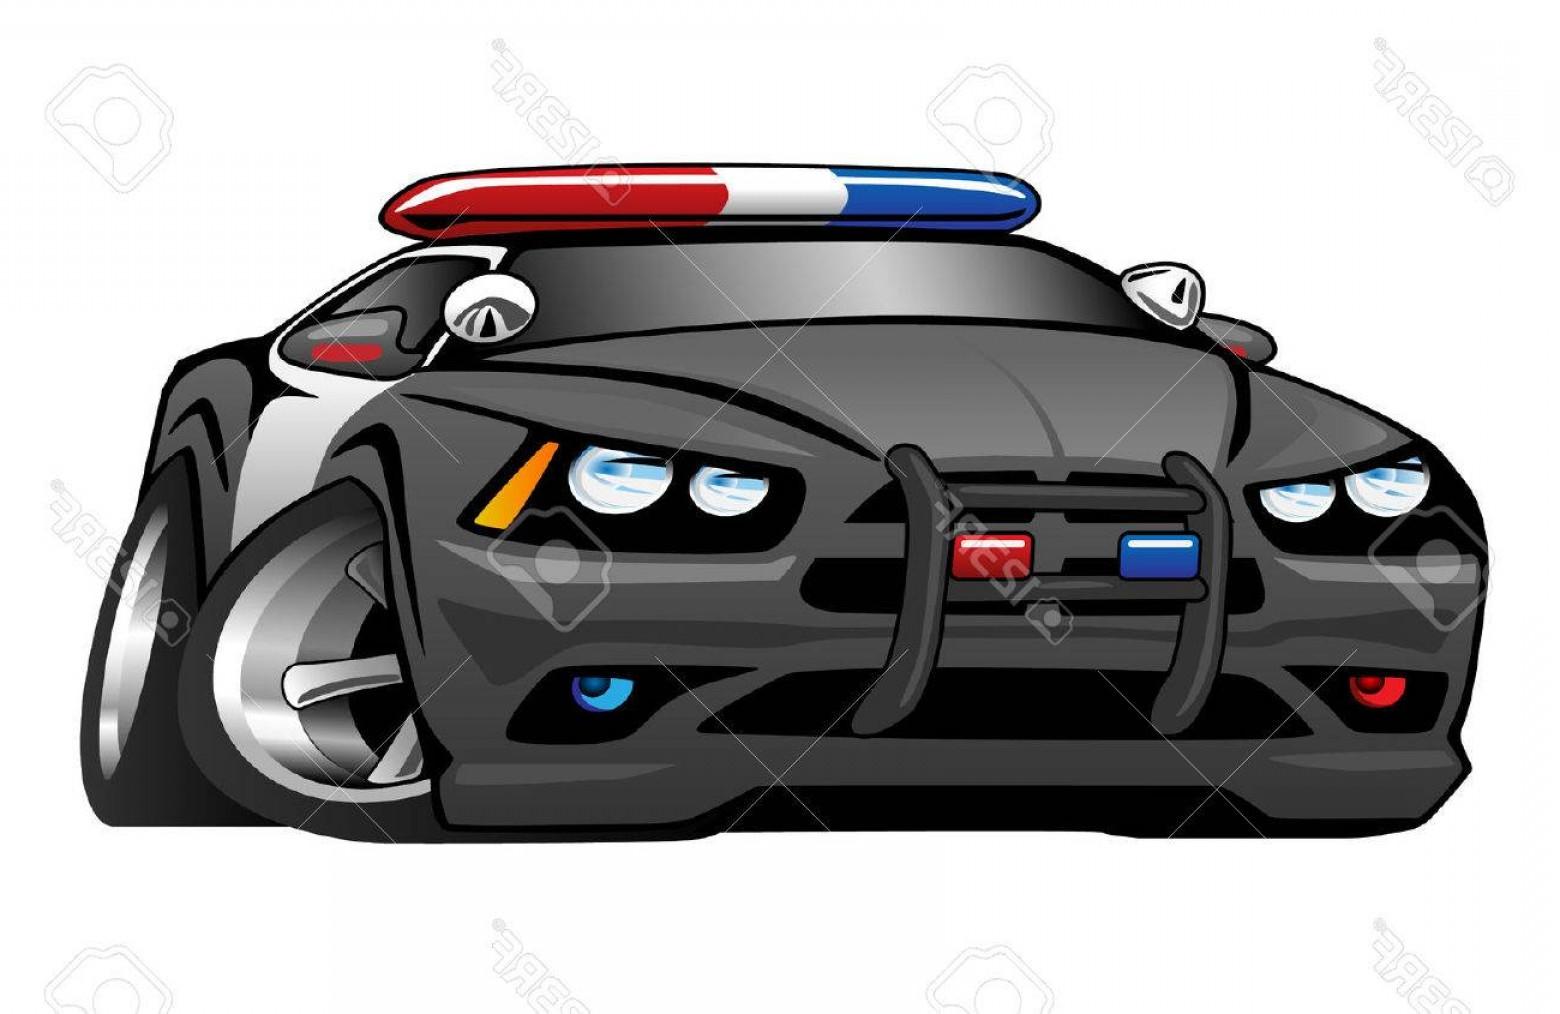 1560x1014 Photostock Vector Police Muscle Car Cartoon Illustration Lazttweet